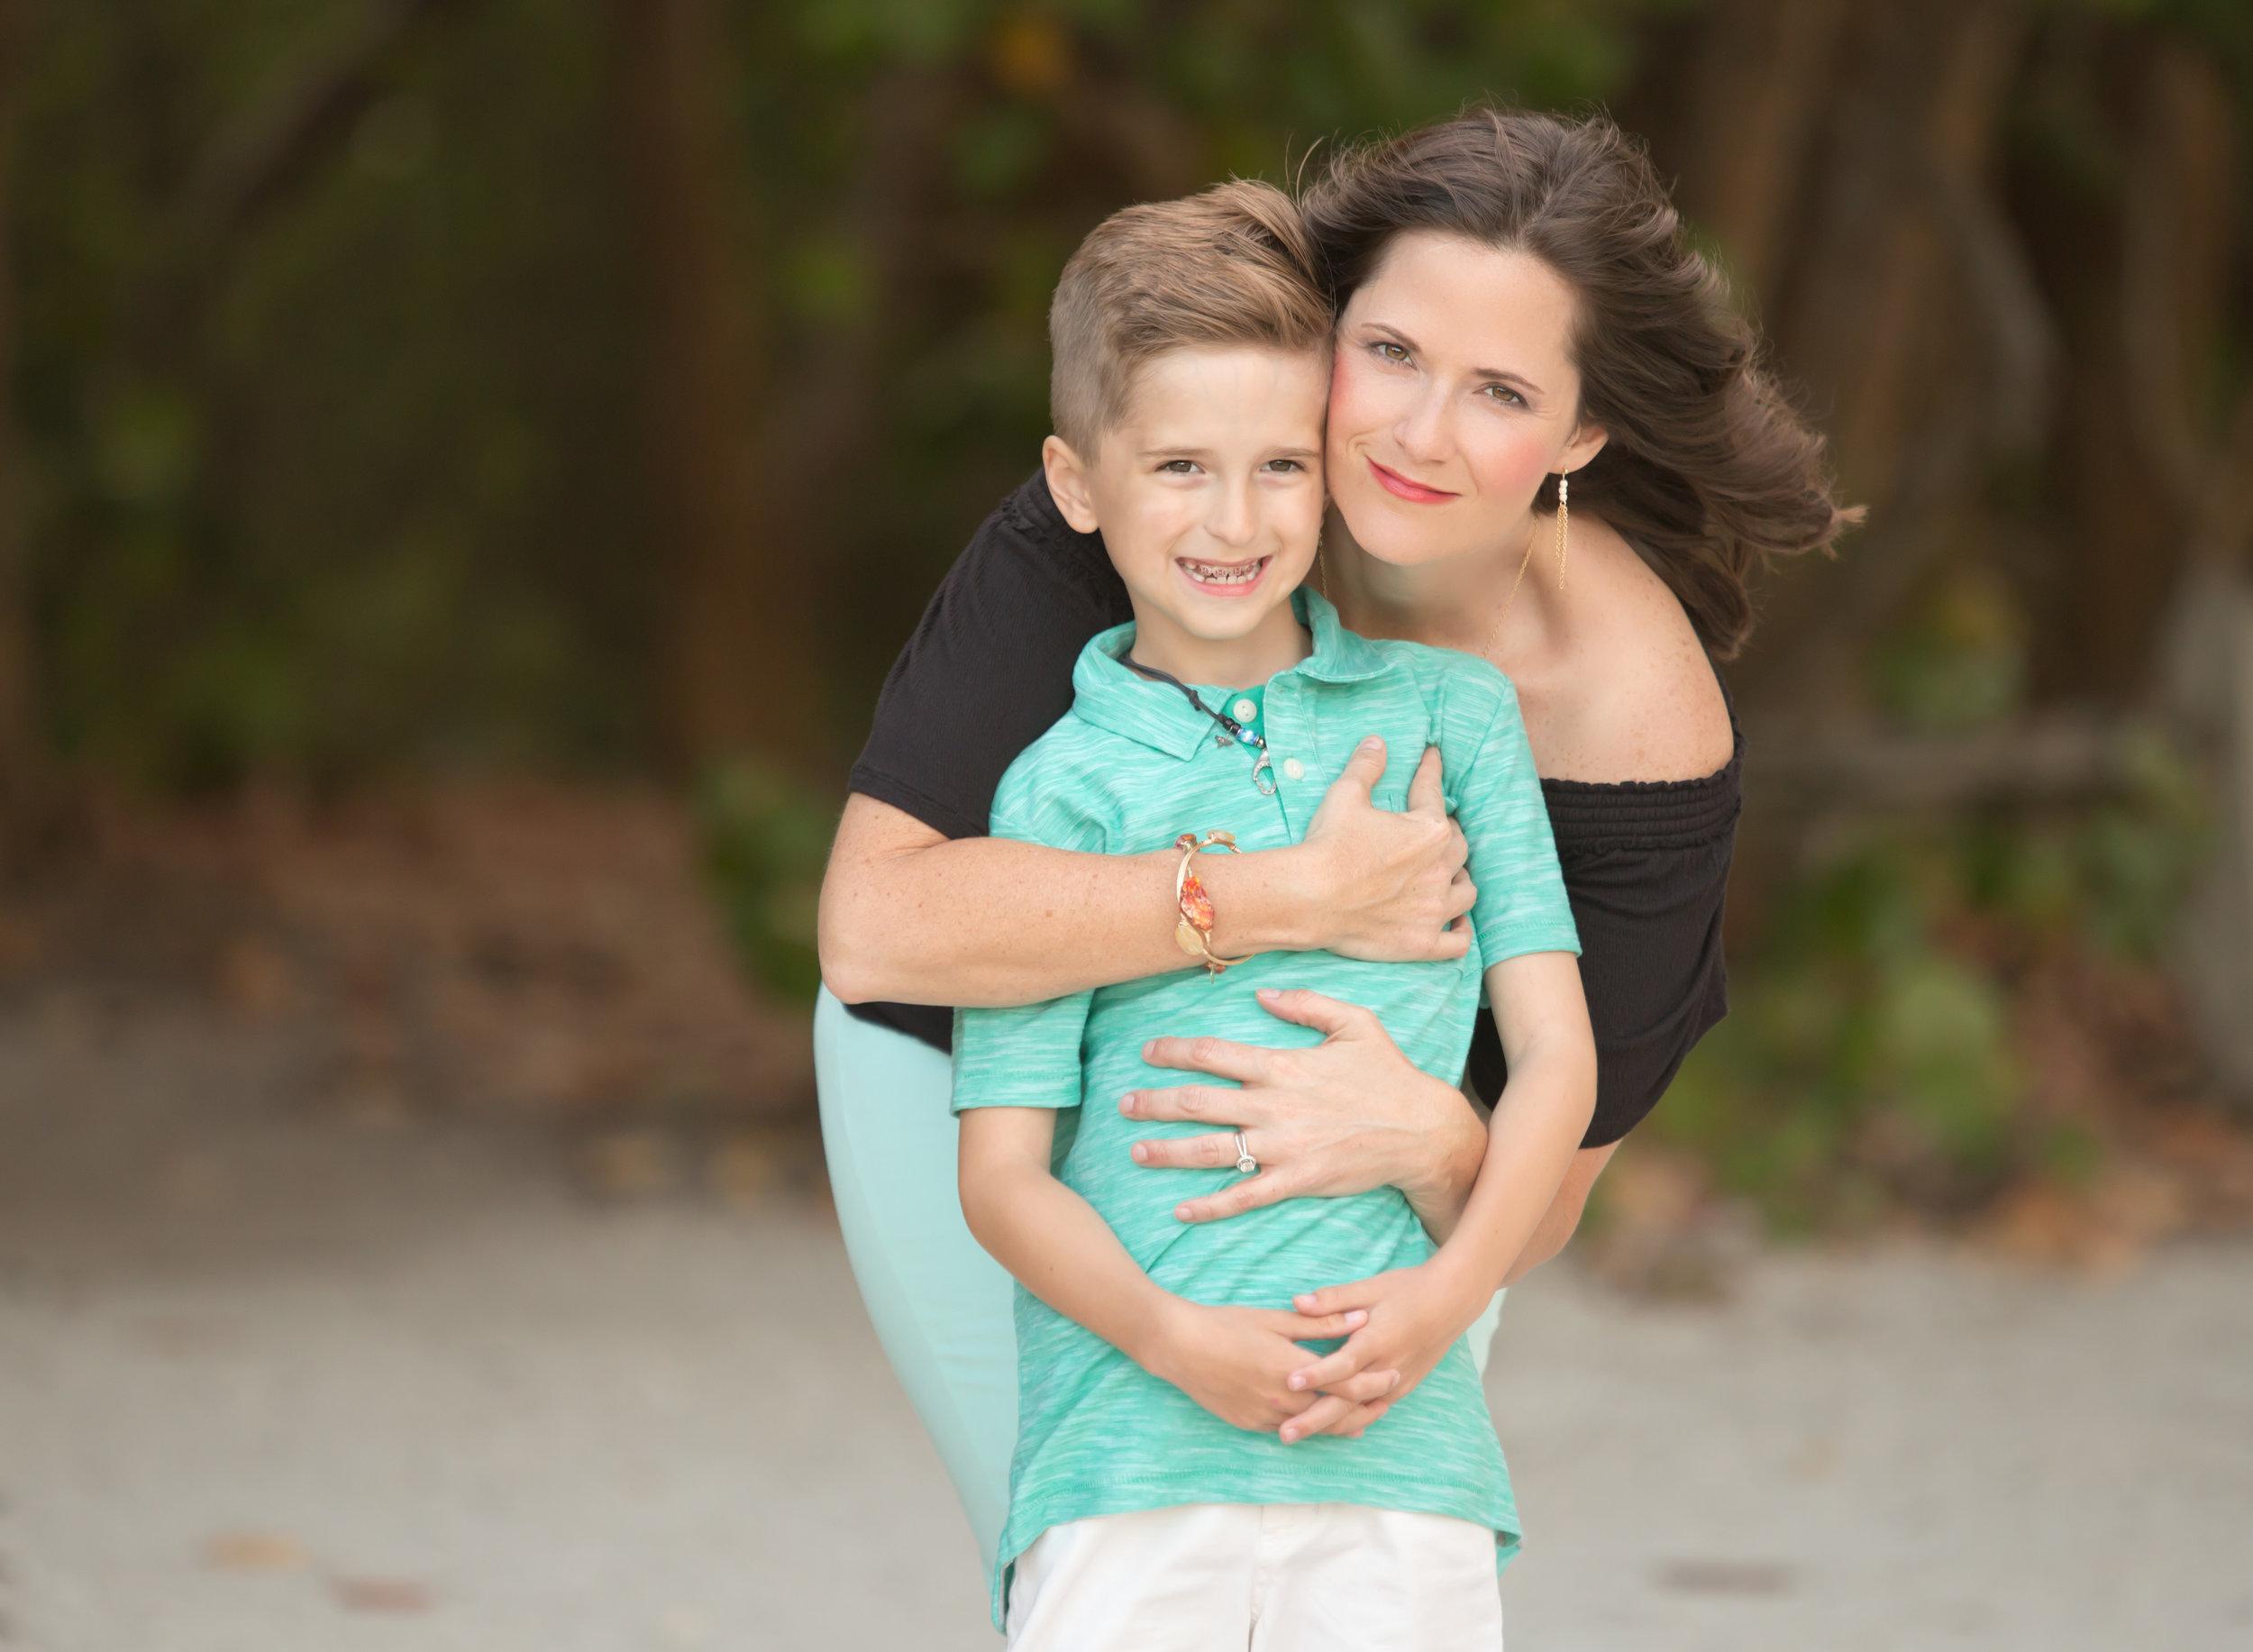 boca-raton-child-photographer-parkland-family-photographer-coral-springs-wellington-lake-worth-boynton-lantana-alissa-delucca-photography-mom-with-son.jpg